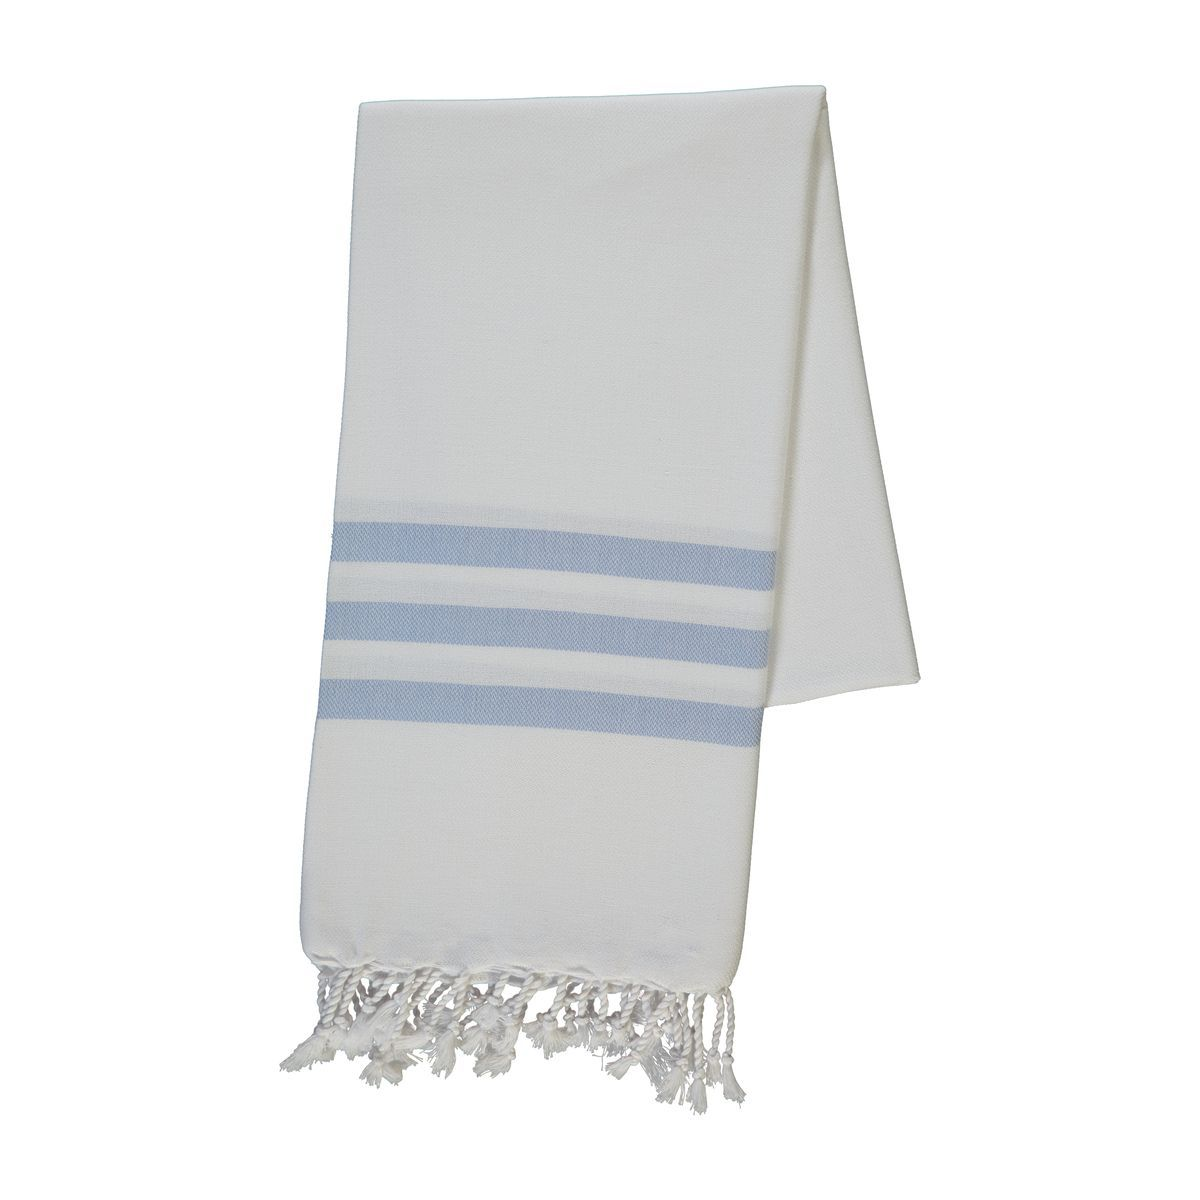 Peshtemal Bala Sultan - Blue Stripes